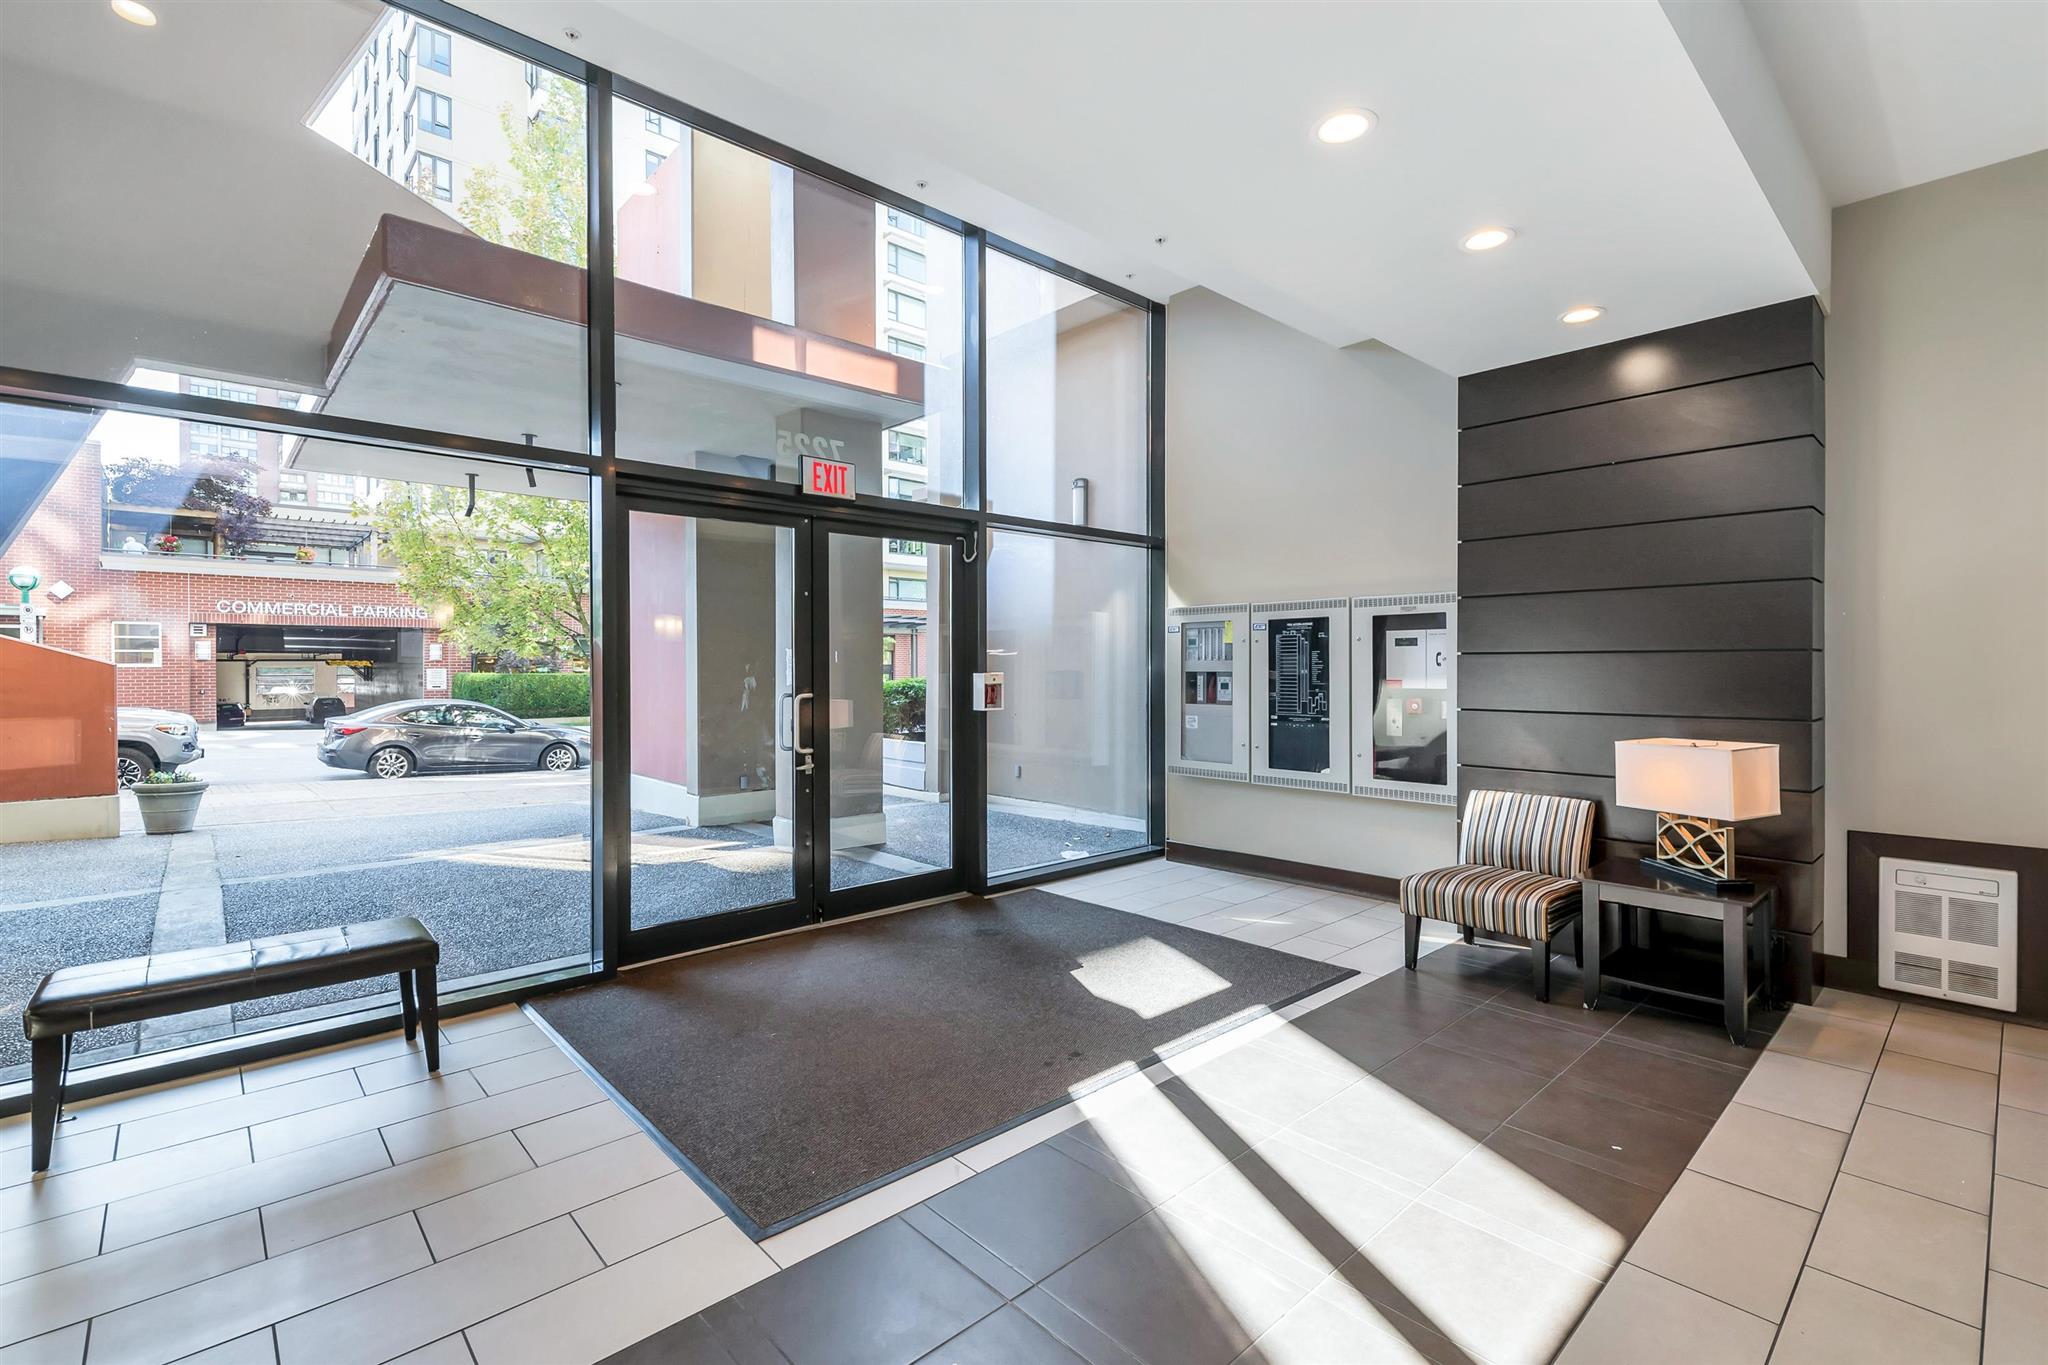 205 7225 ACORN AVENUE - Highgate Apartment/Condo for sale, 2 Bedrooms (R2606454) - #26